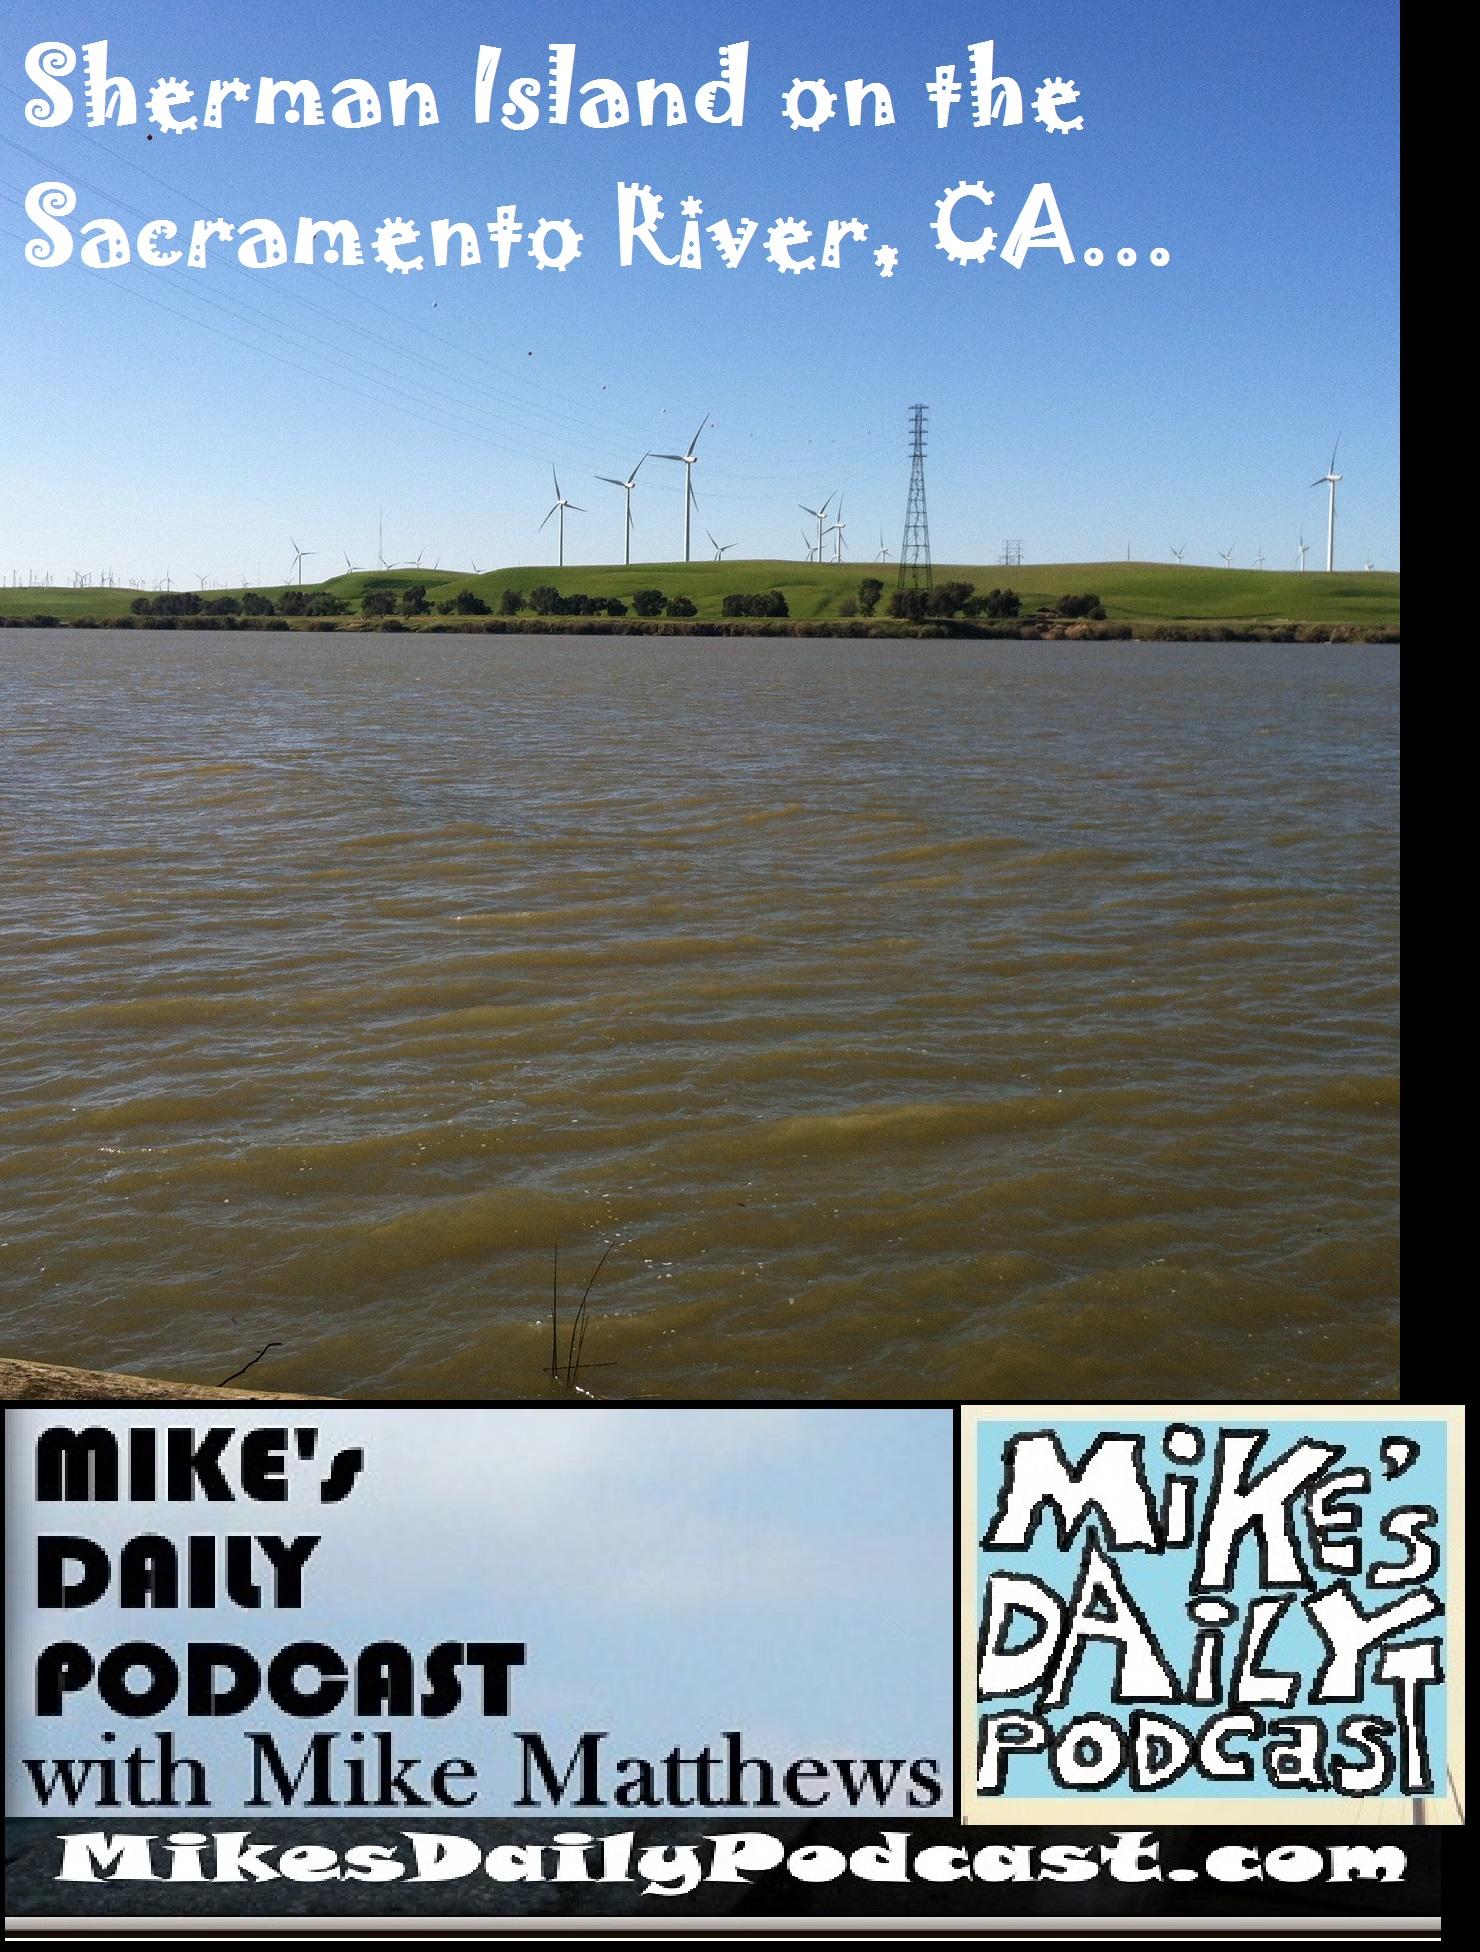 MIKEs DAILY PODCAST 1069 Sherman Island California